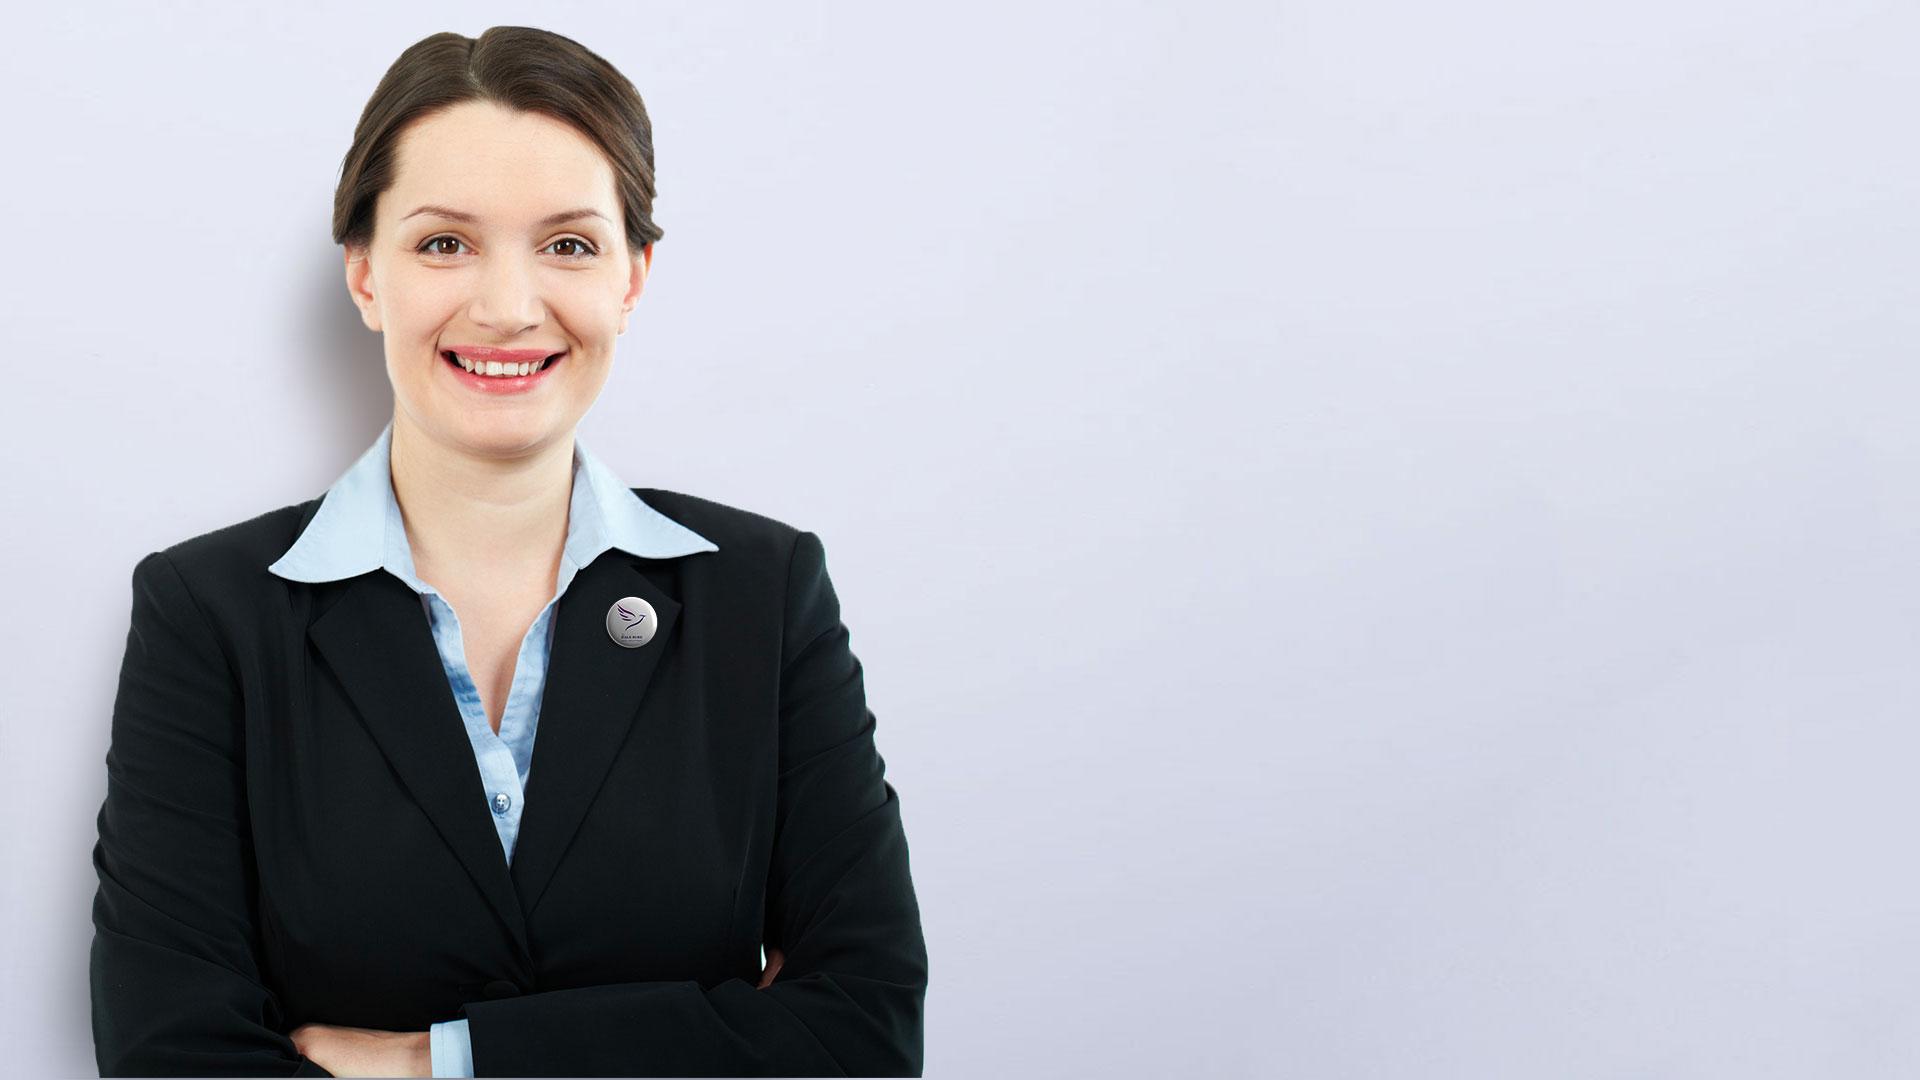 Hale Sure Care Recruitment